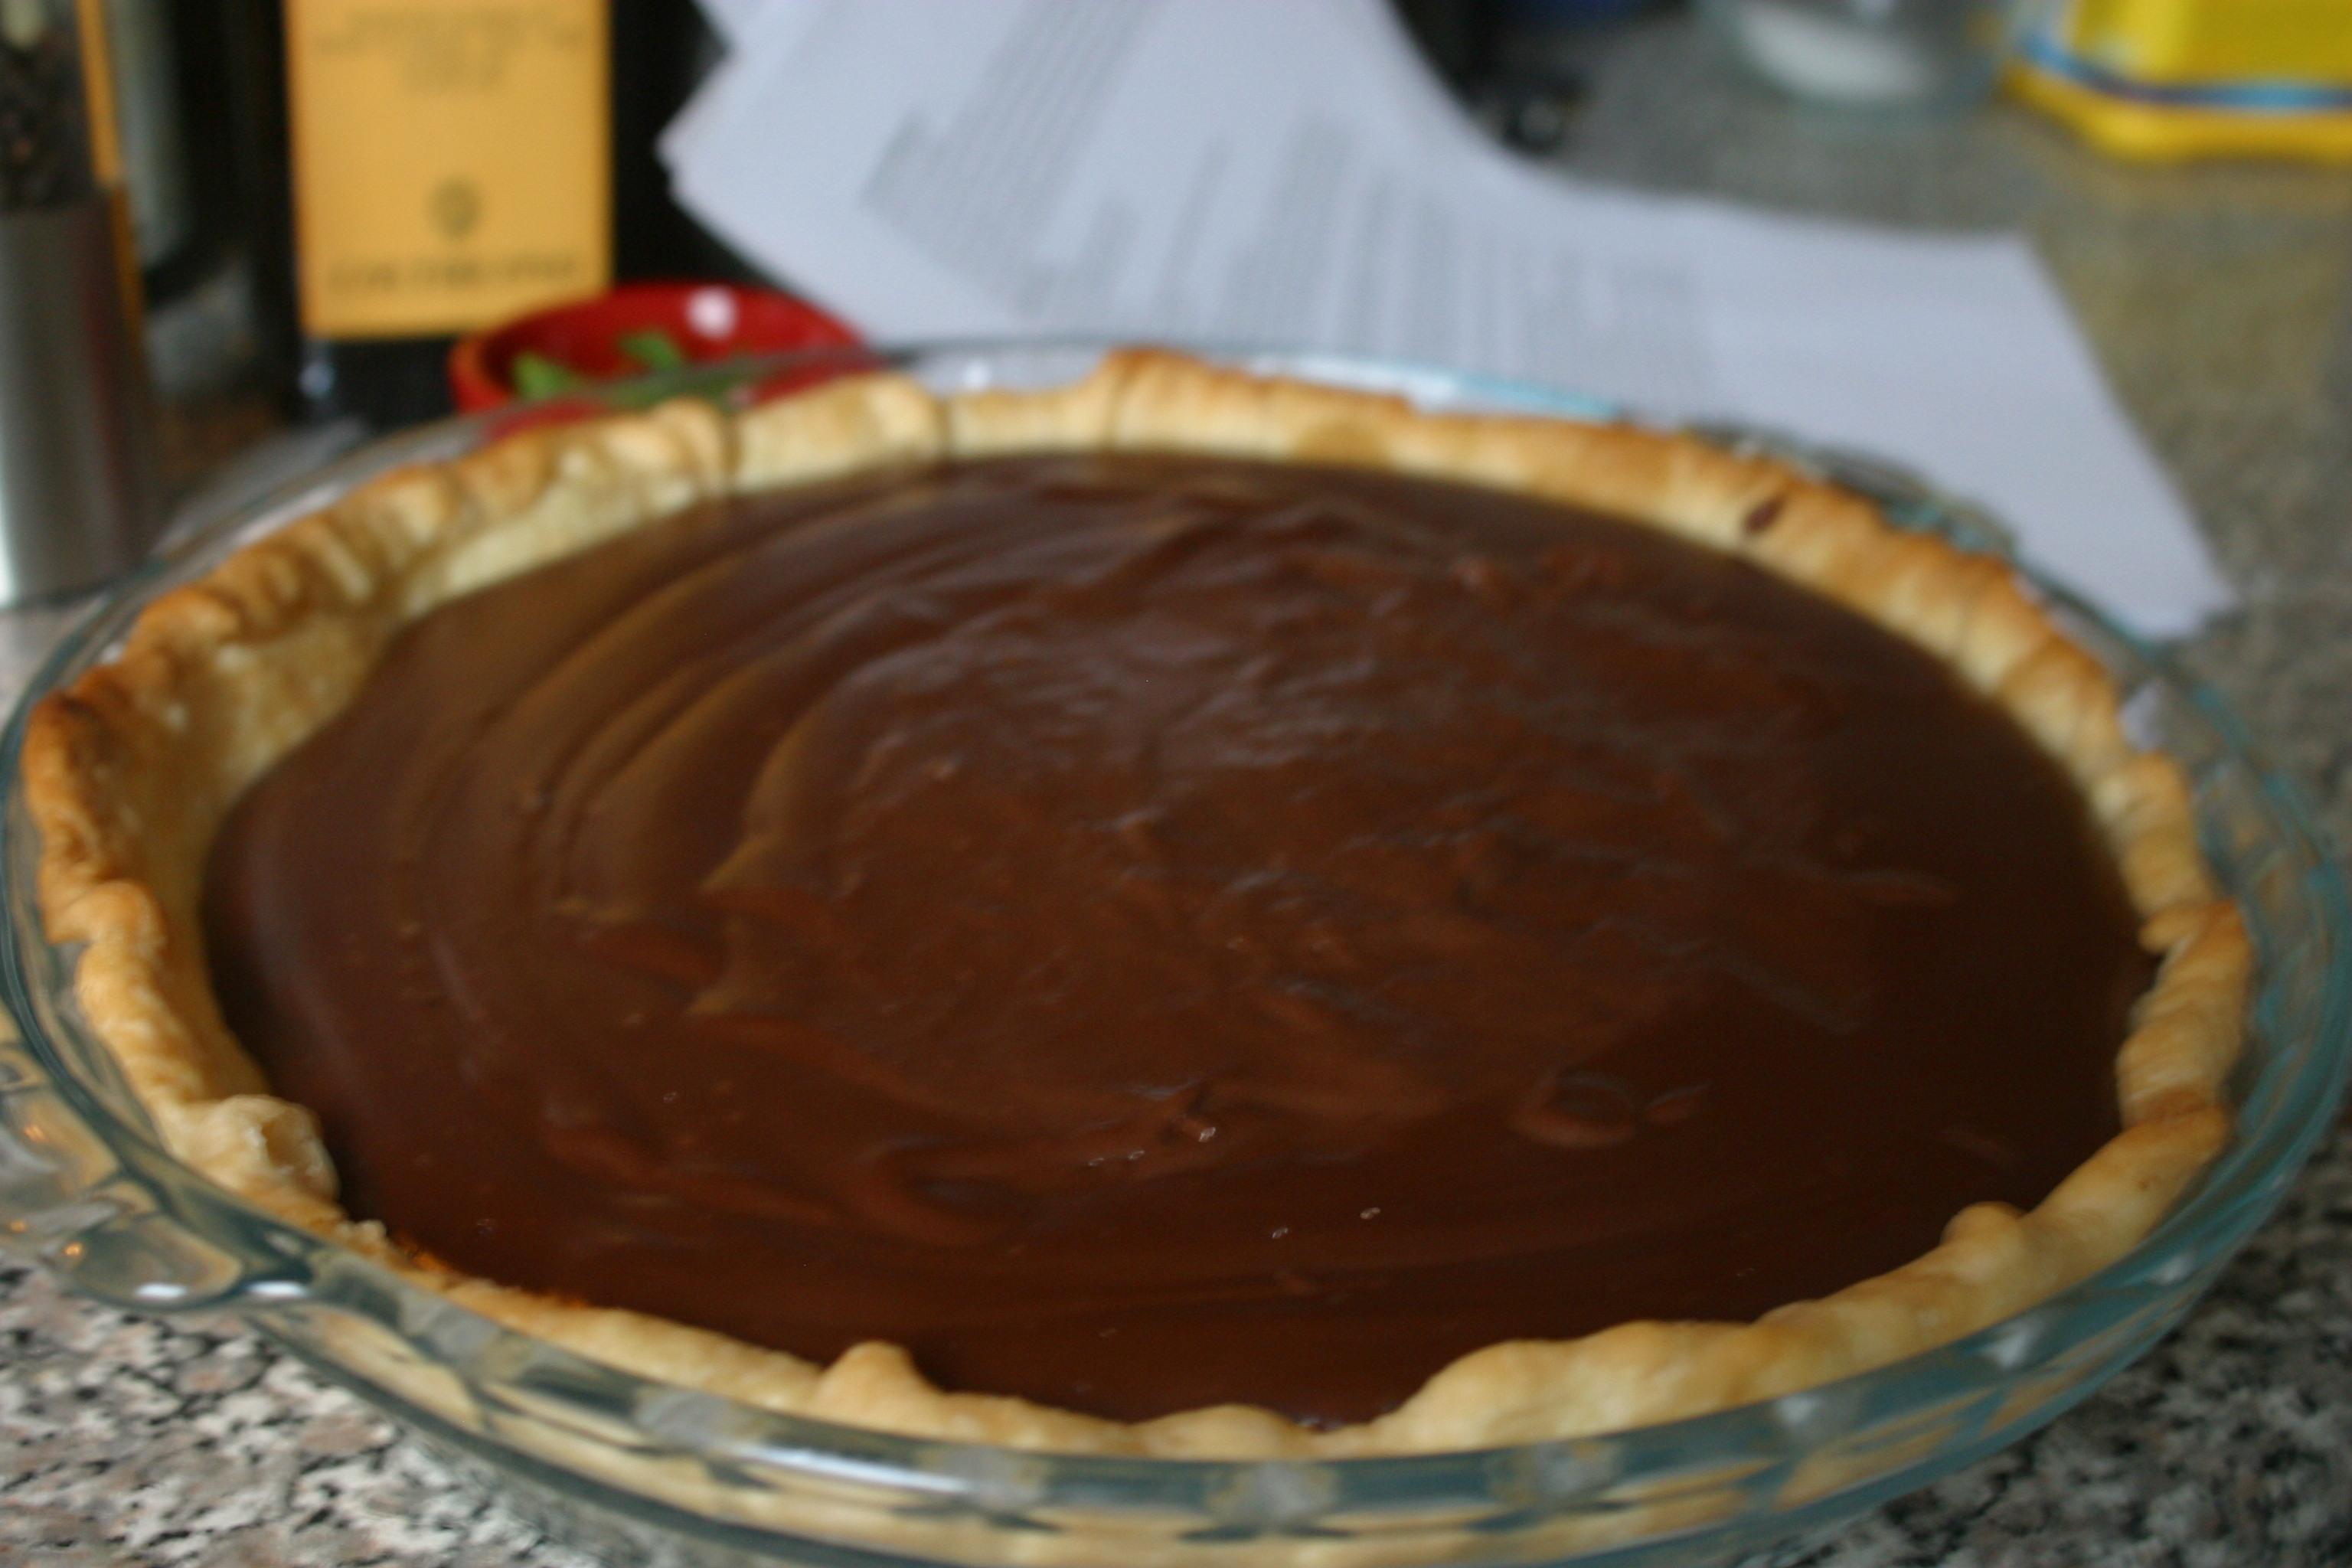 Happy Half-Tau (π) Day Chocolate Pudding Pie   Artful Wish